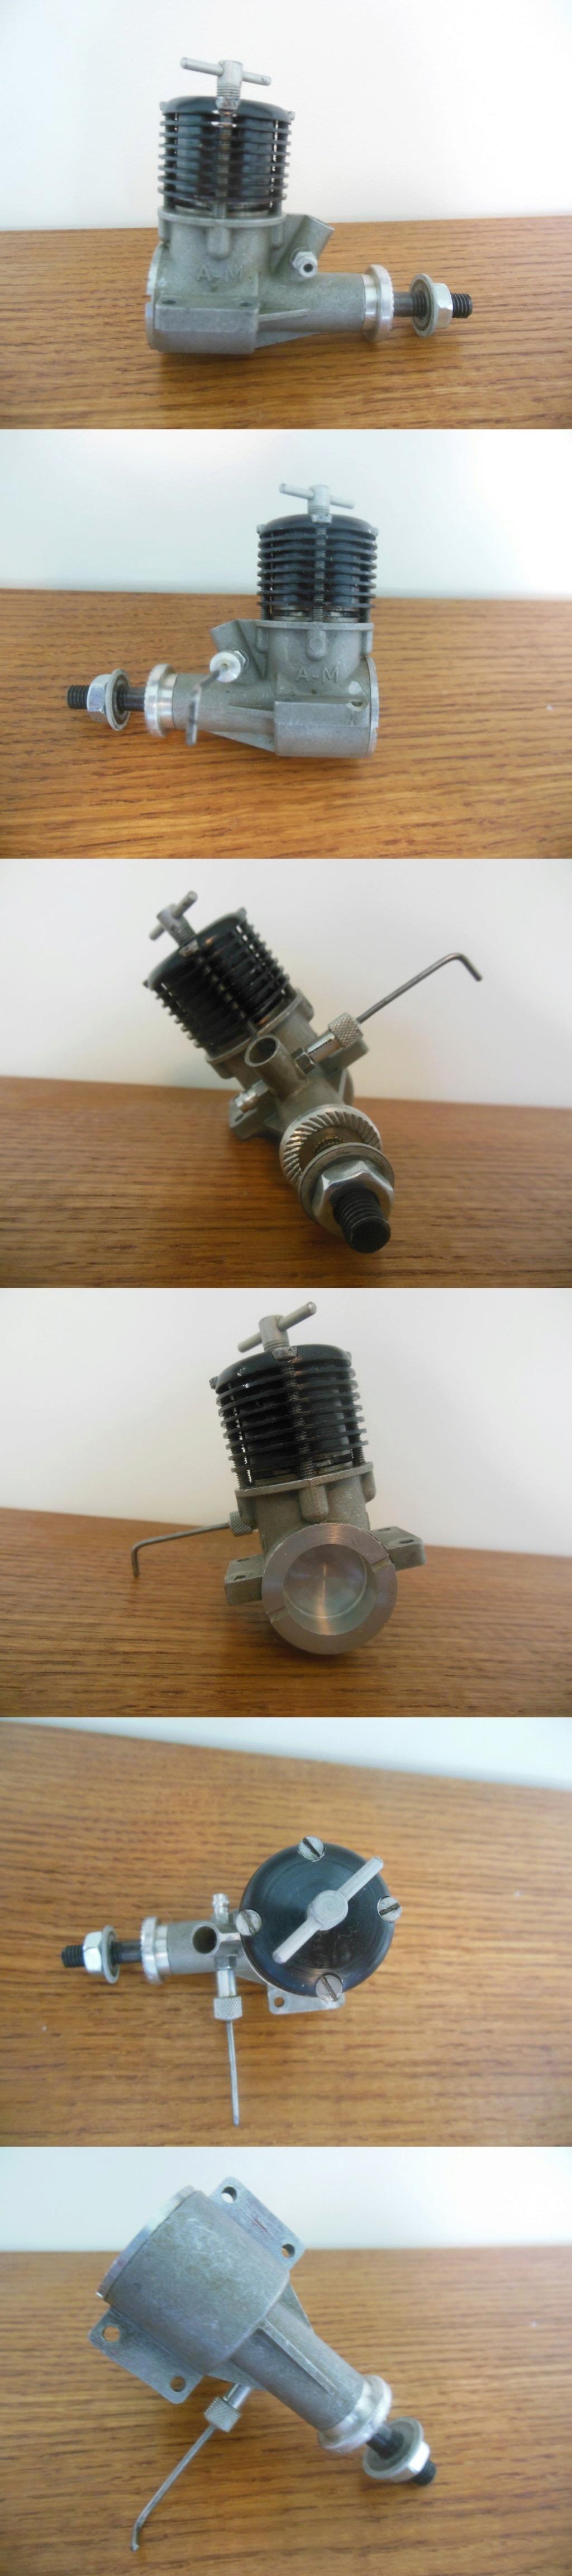 AM25 2.5cc Diesel engine Am25_f10